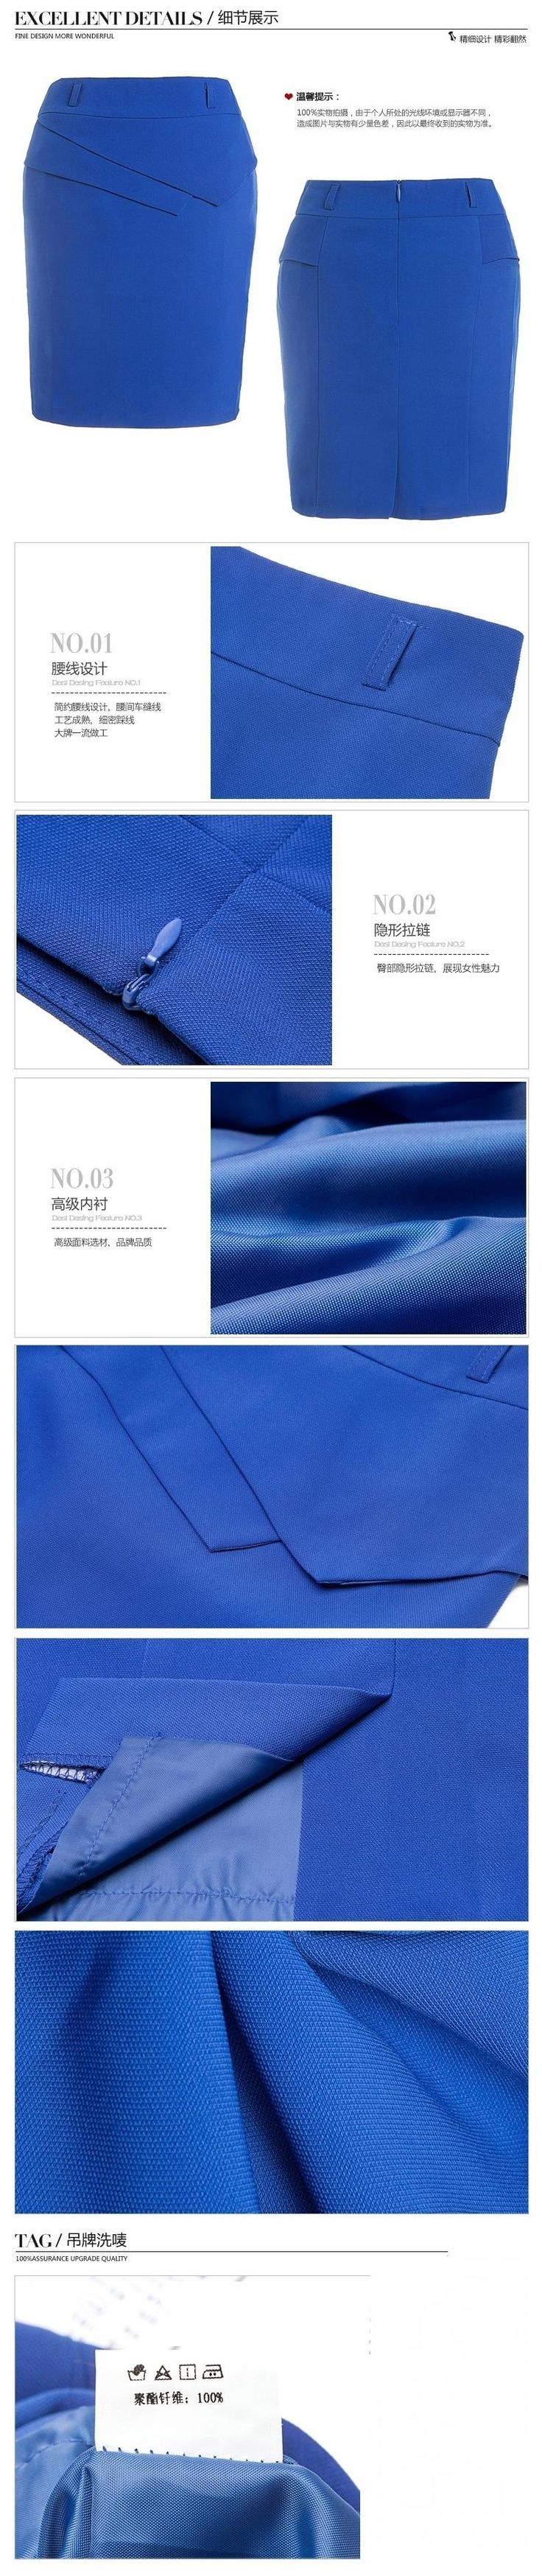 Set: Contrast-Trim Blazer + Pencil Skirt - Aision | YESSTYLE